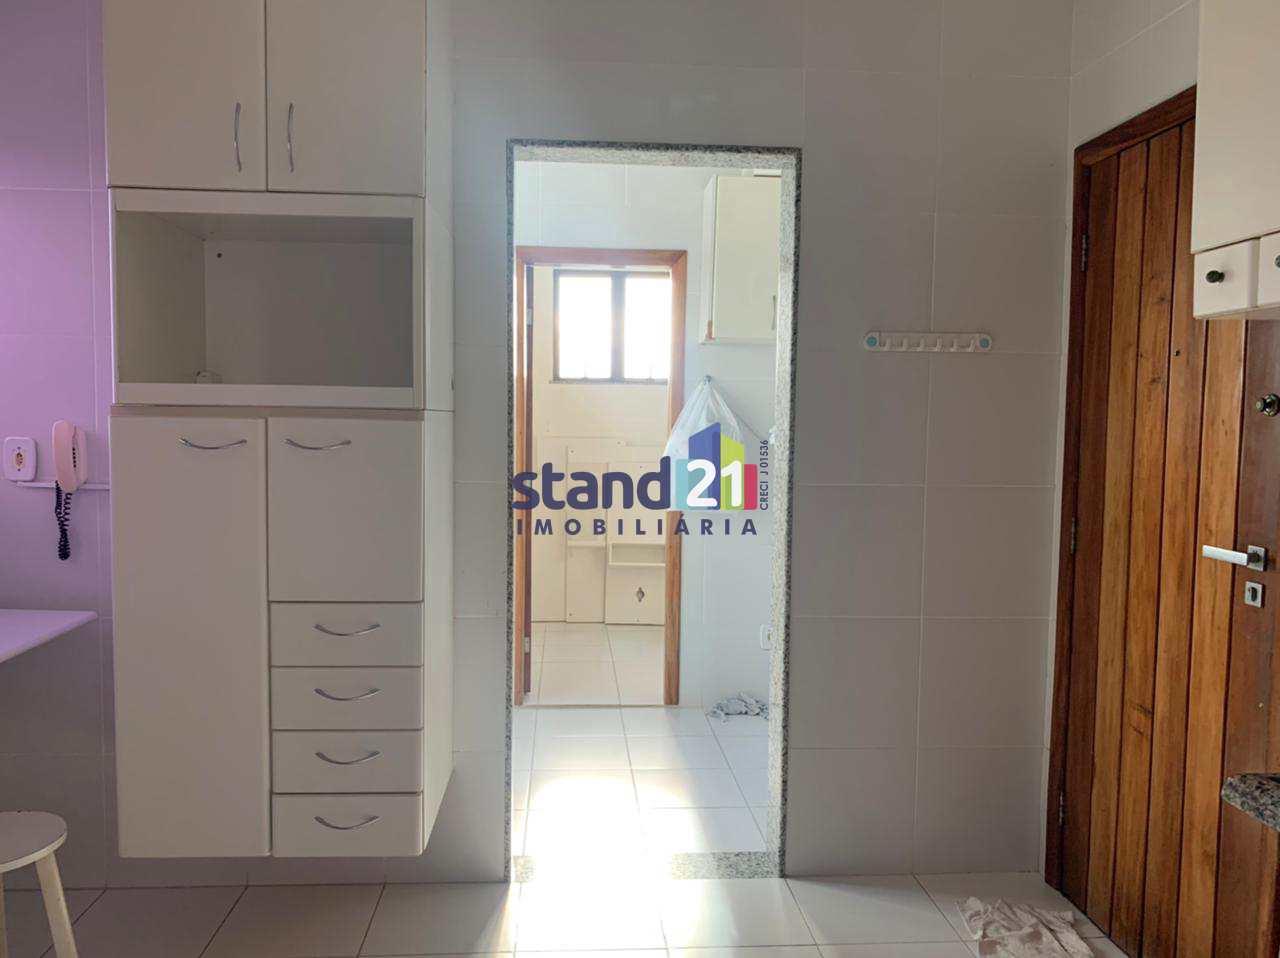 Apartamento com 3 dorms, Jardim Vitória, Itabuna - R$ 750 mil, Cod: 744